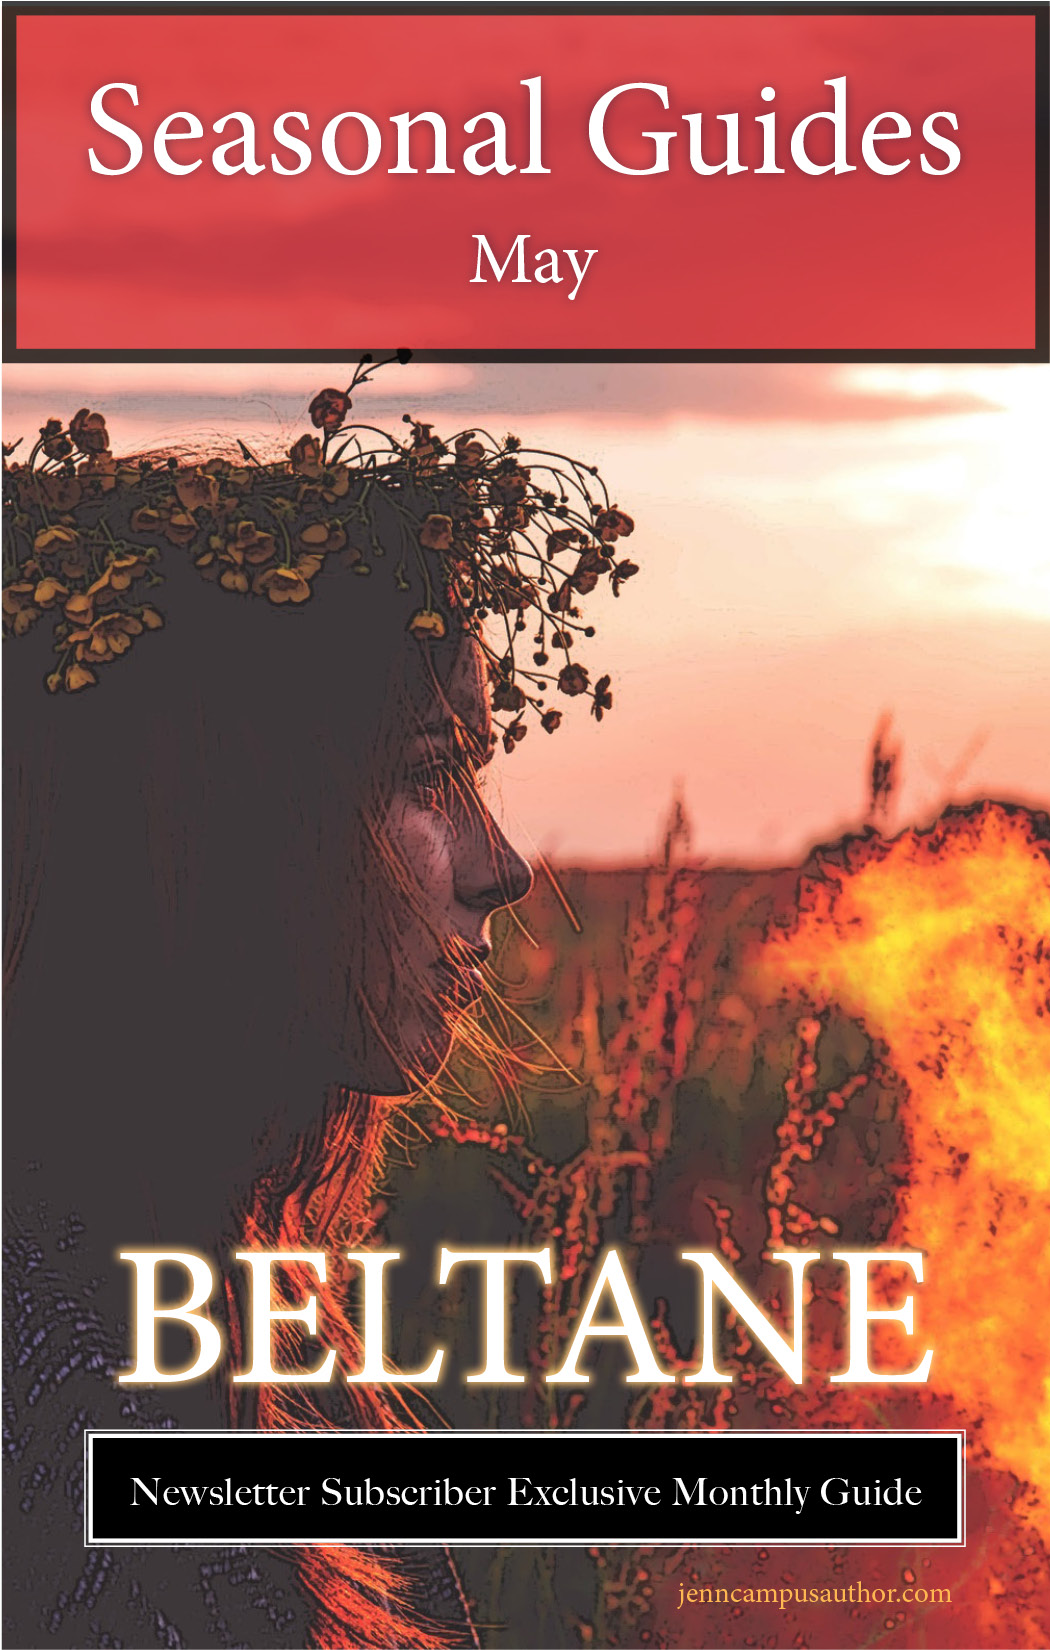 Seasonal Guide for May - Beltane